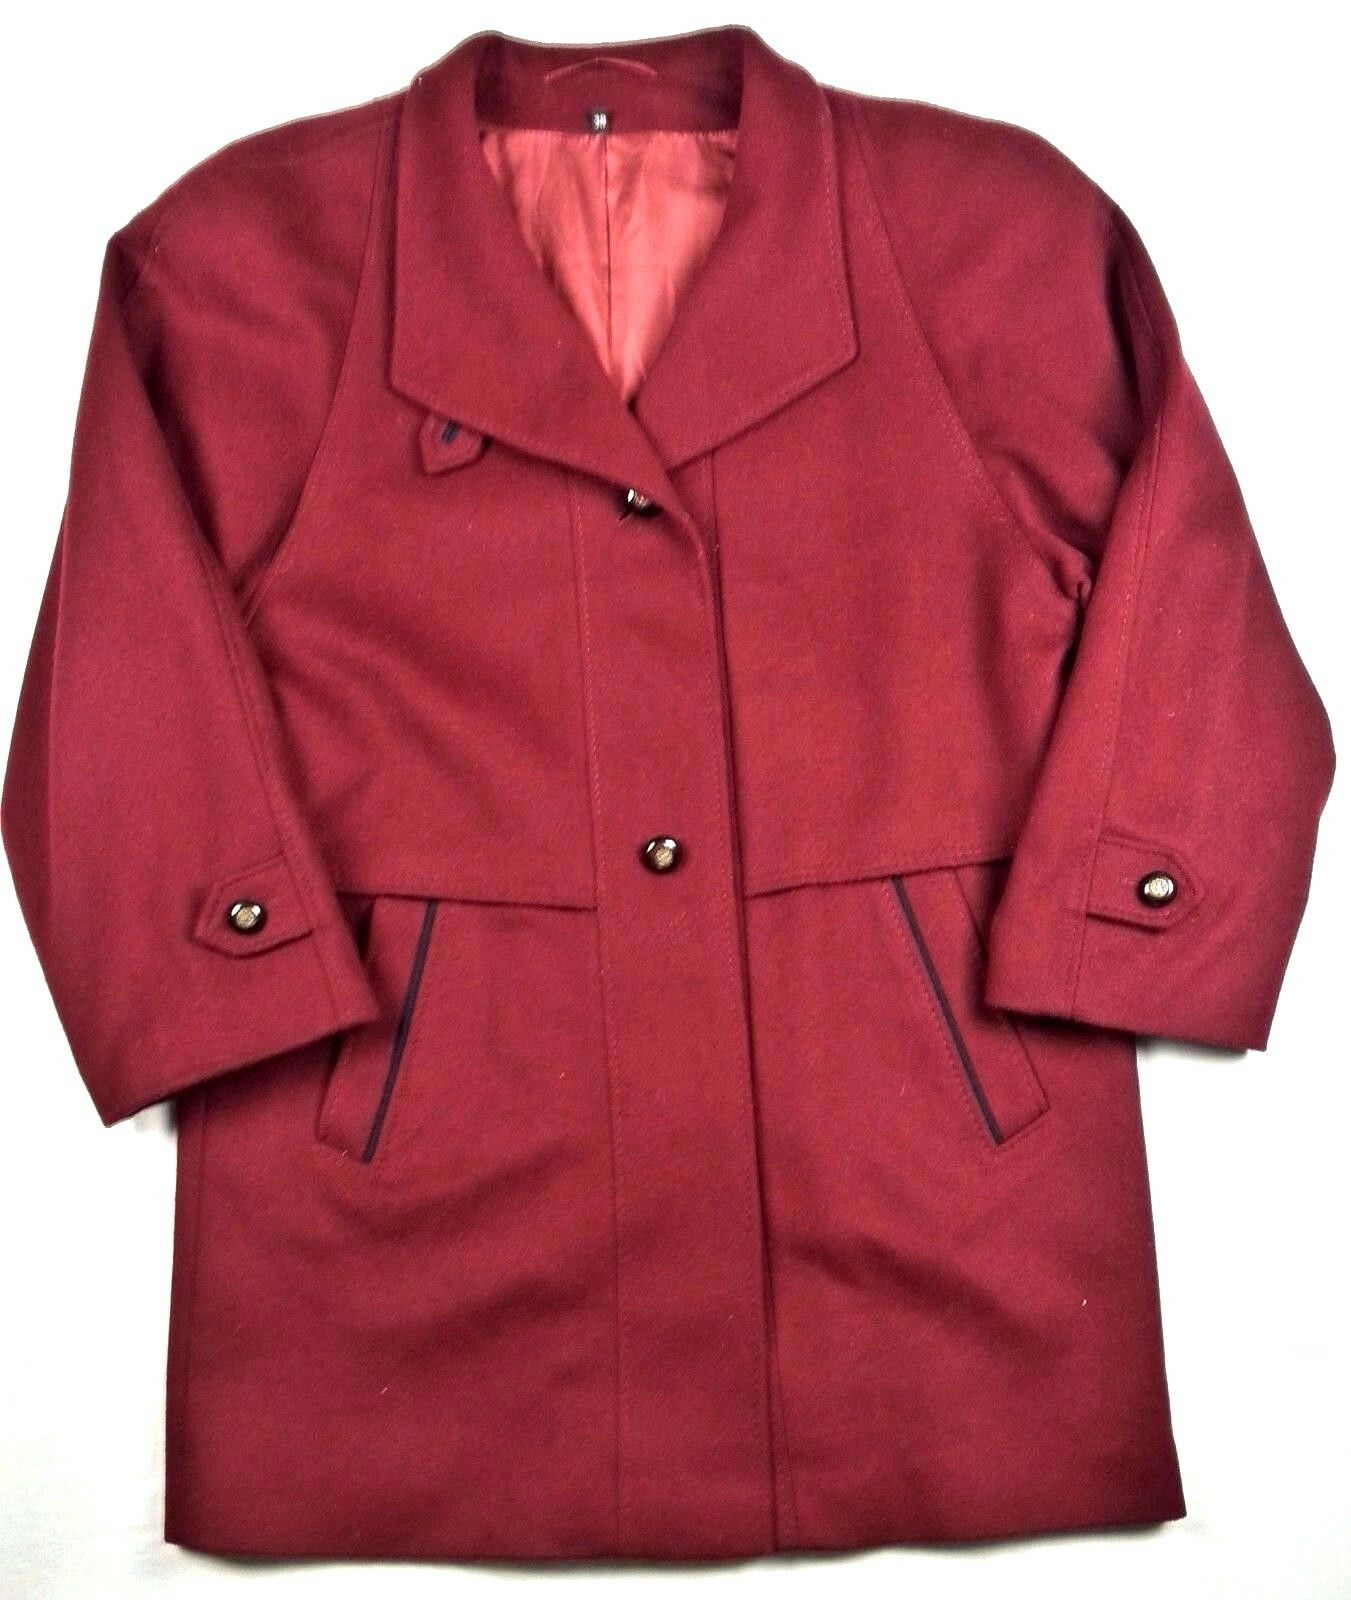 Manfred Mettner Womens Wool Coat Size 38 Aquila Alpacca Loden Berlin Alapca